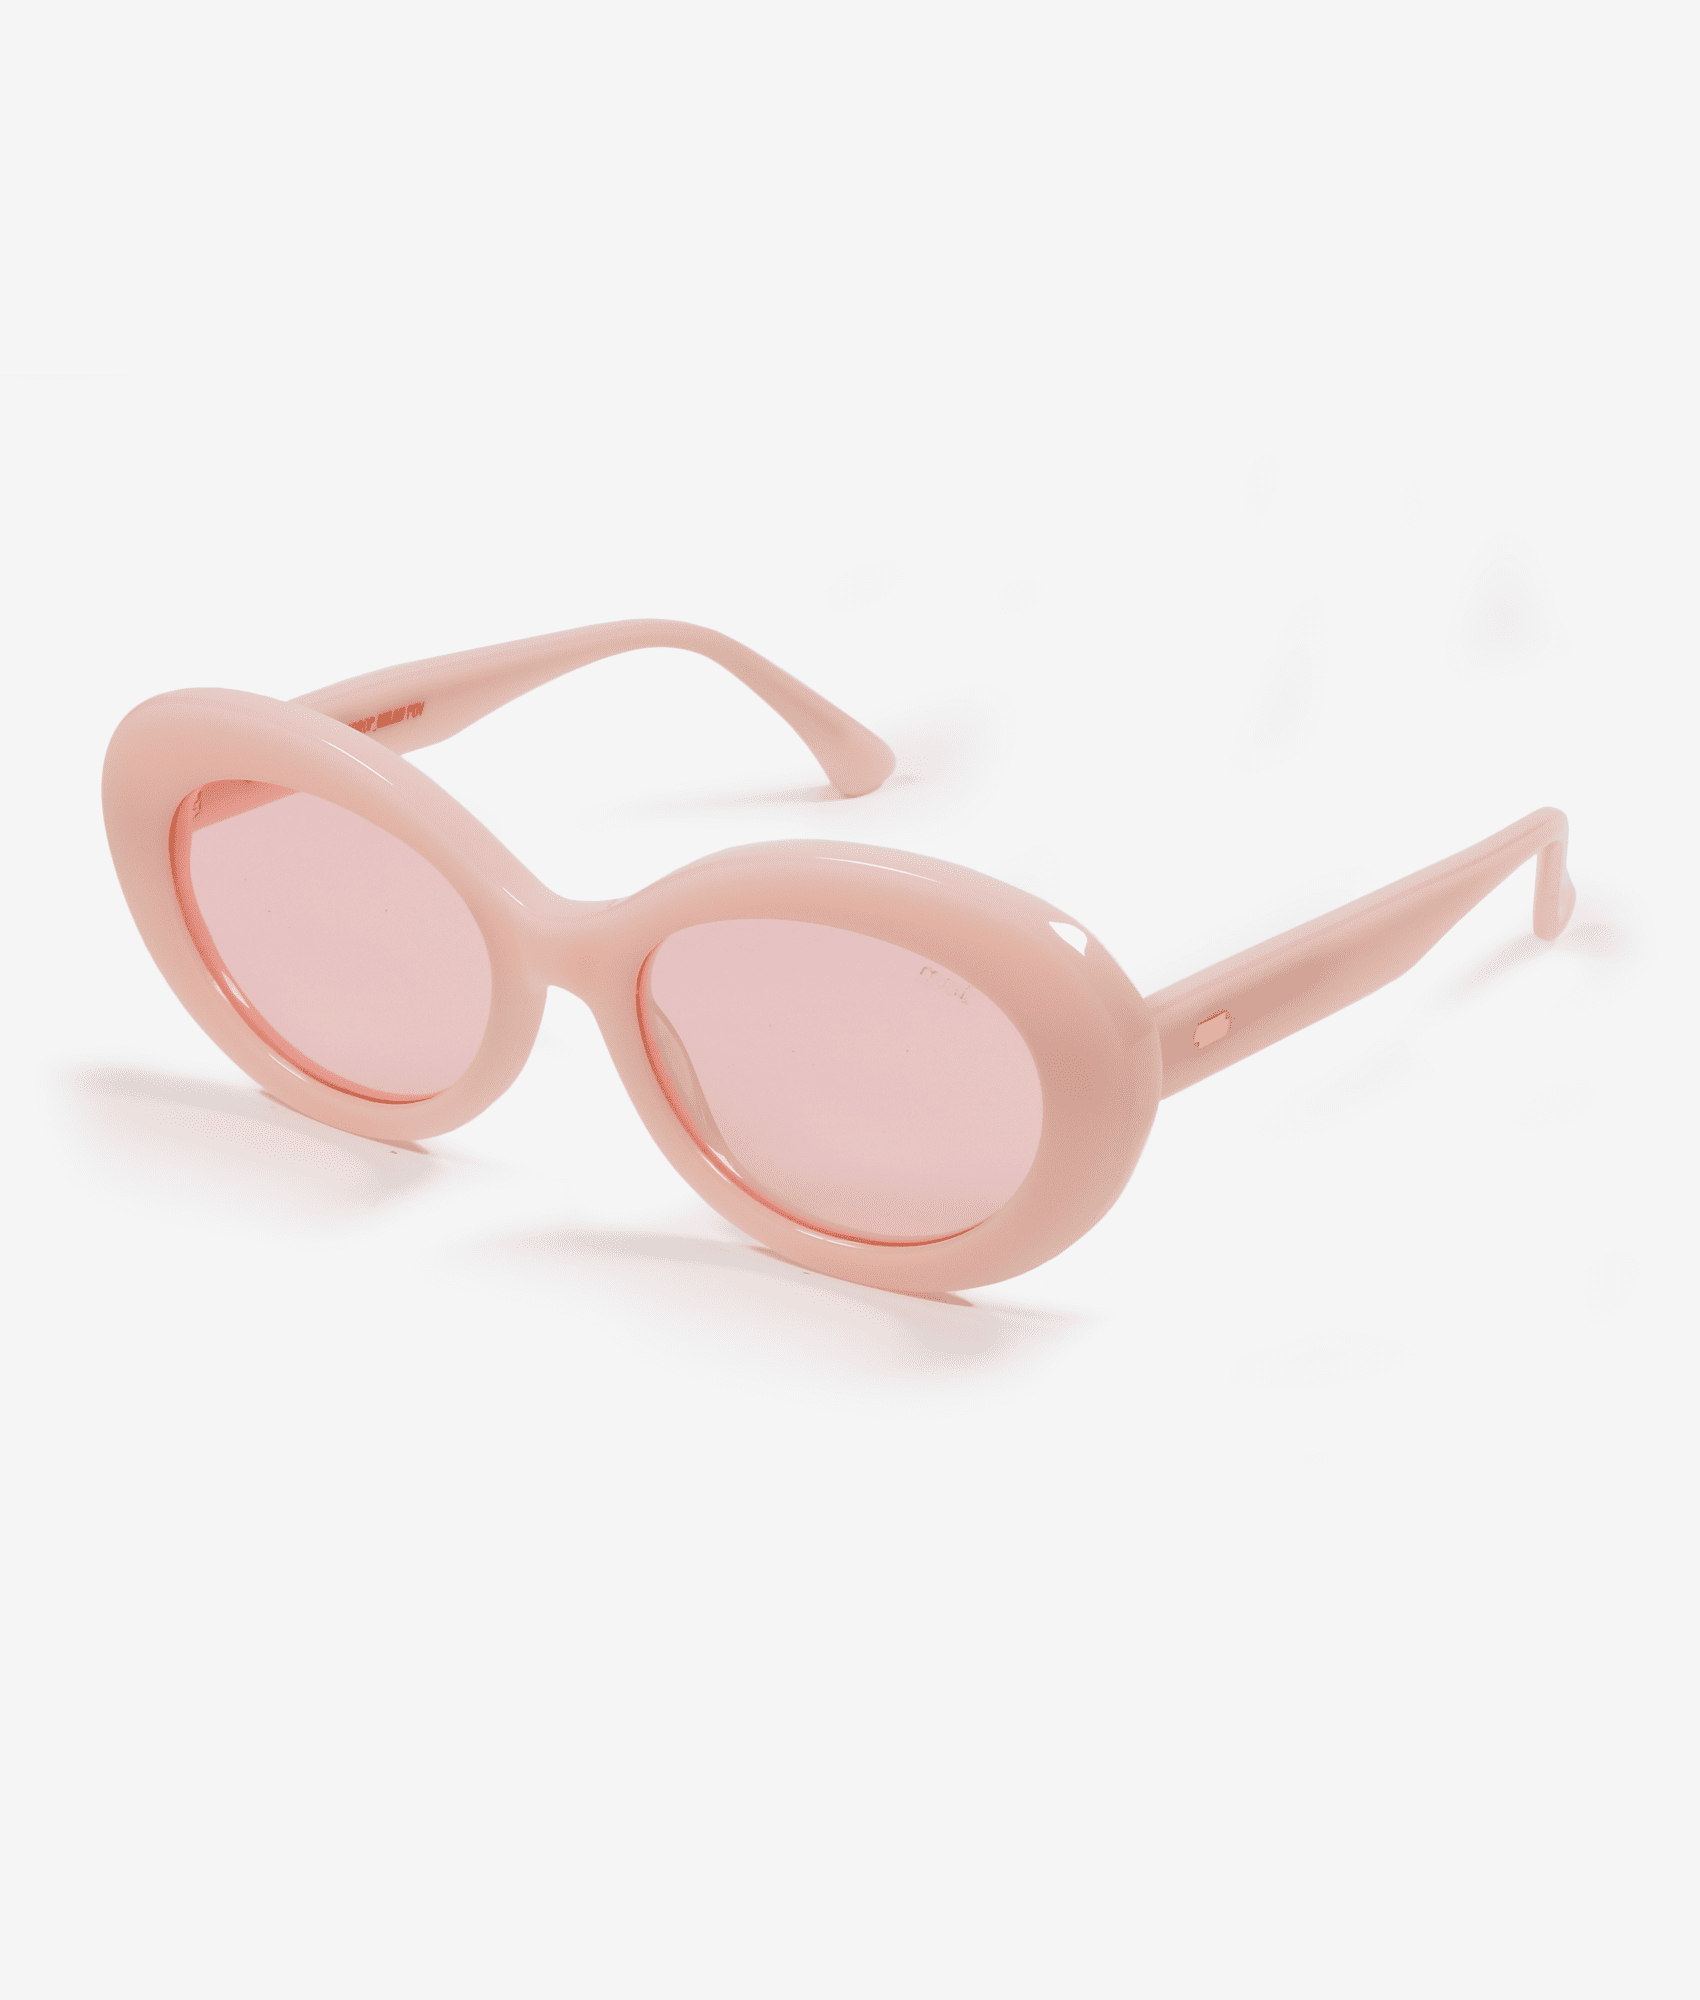 VENTI 154 Gast Sunglasses